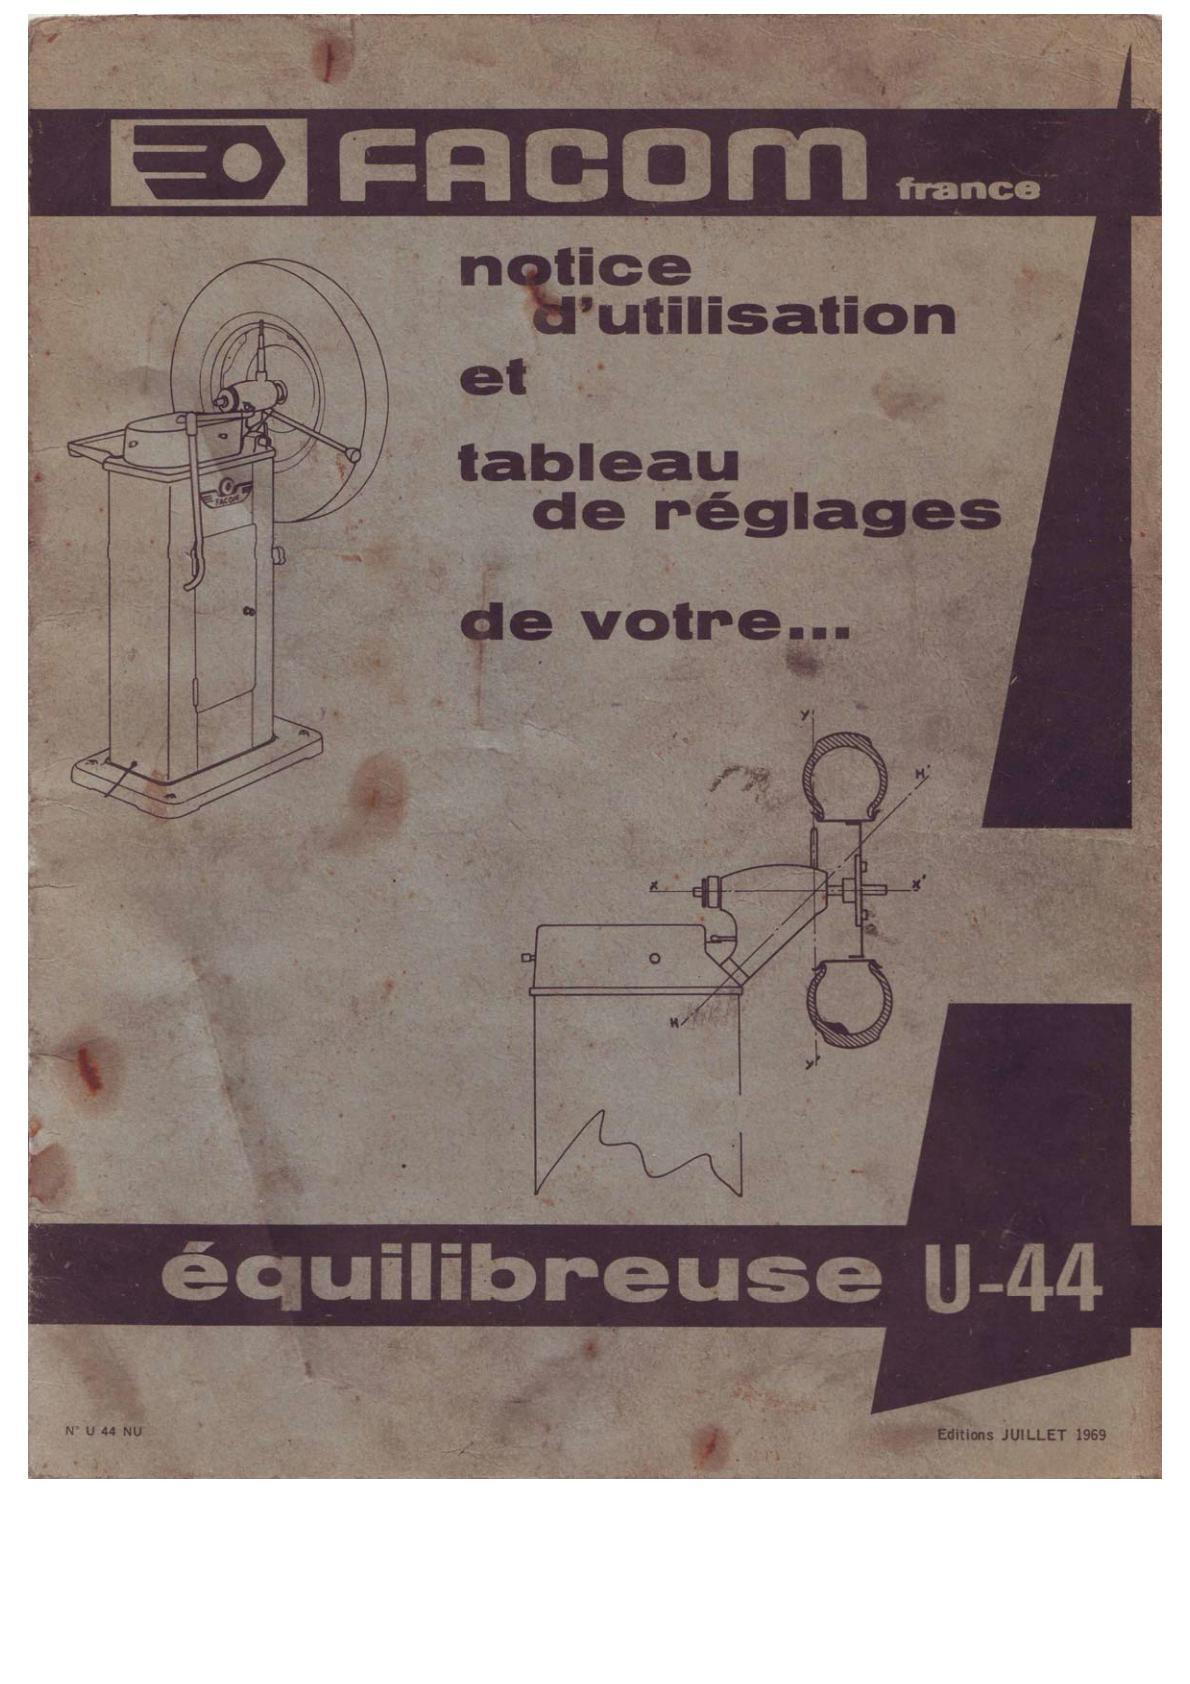 Equilibreuse Facom U-44 Uw110